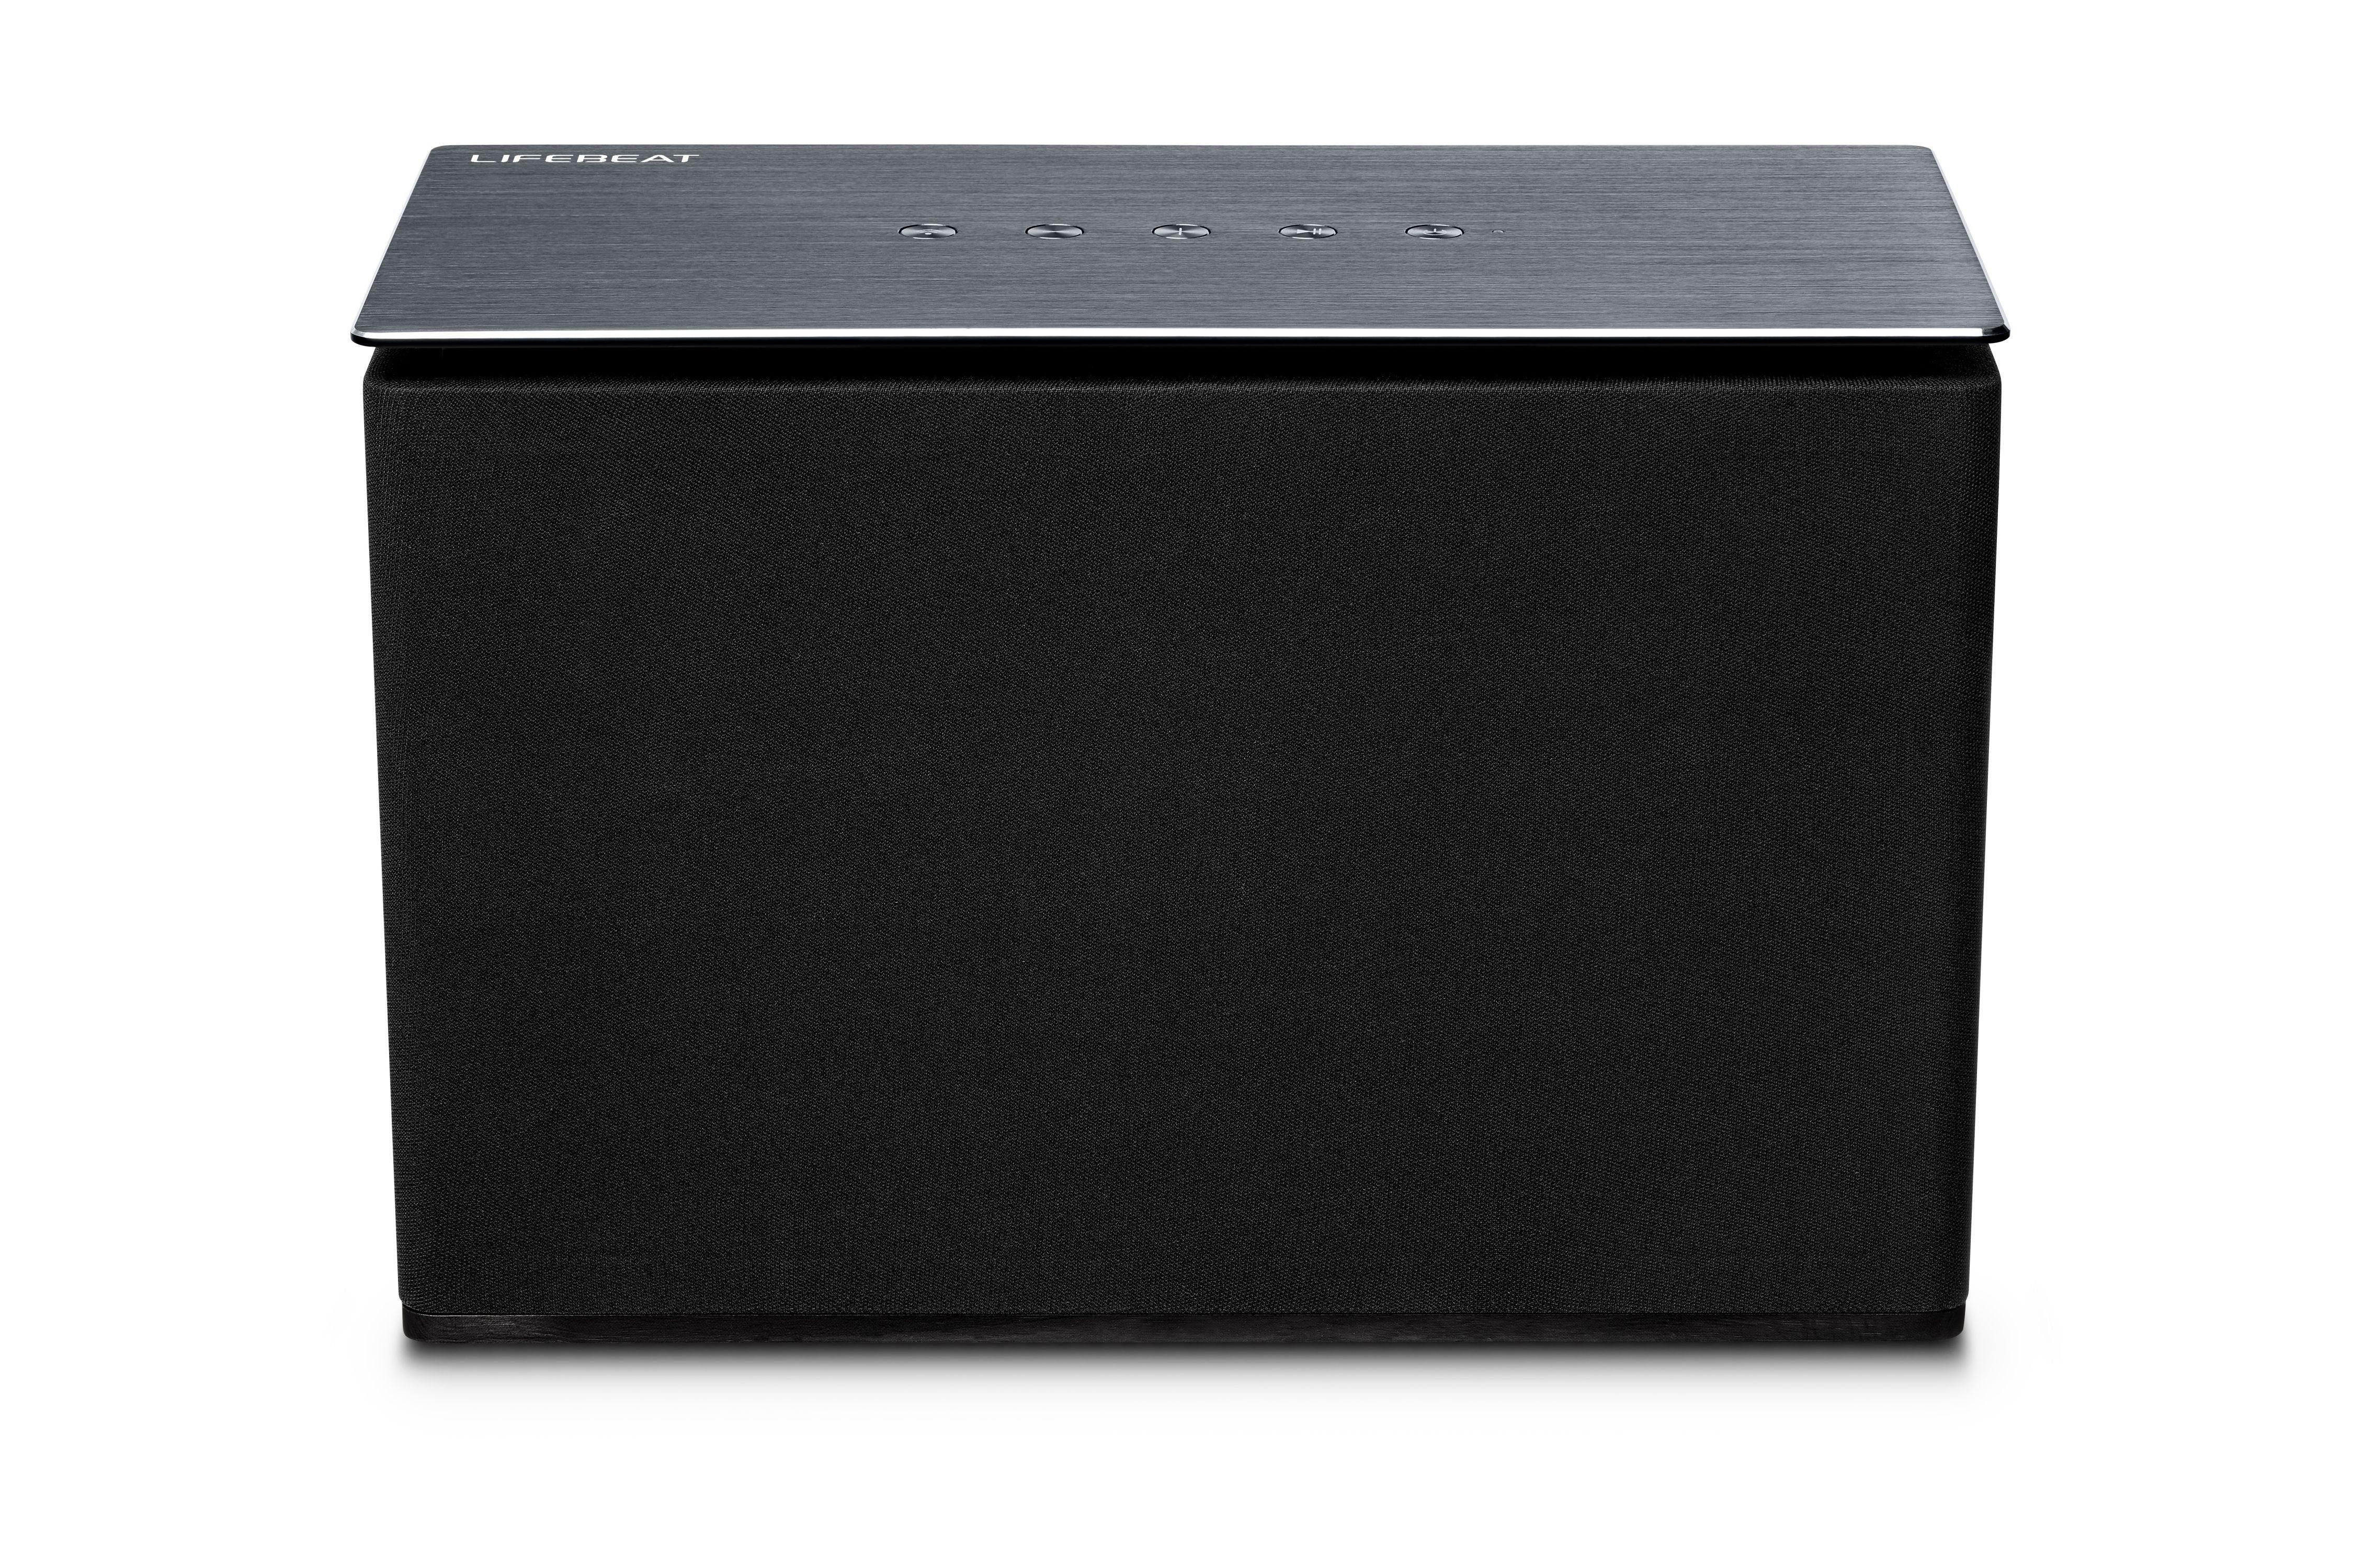 MEDION® Multiroom Lautsprecher X61073 (MD43057) »WLAN Multiroom Lautsprecher«